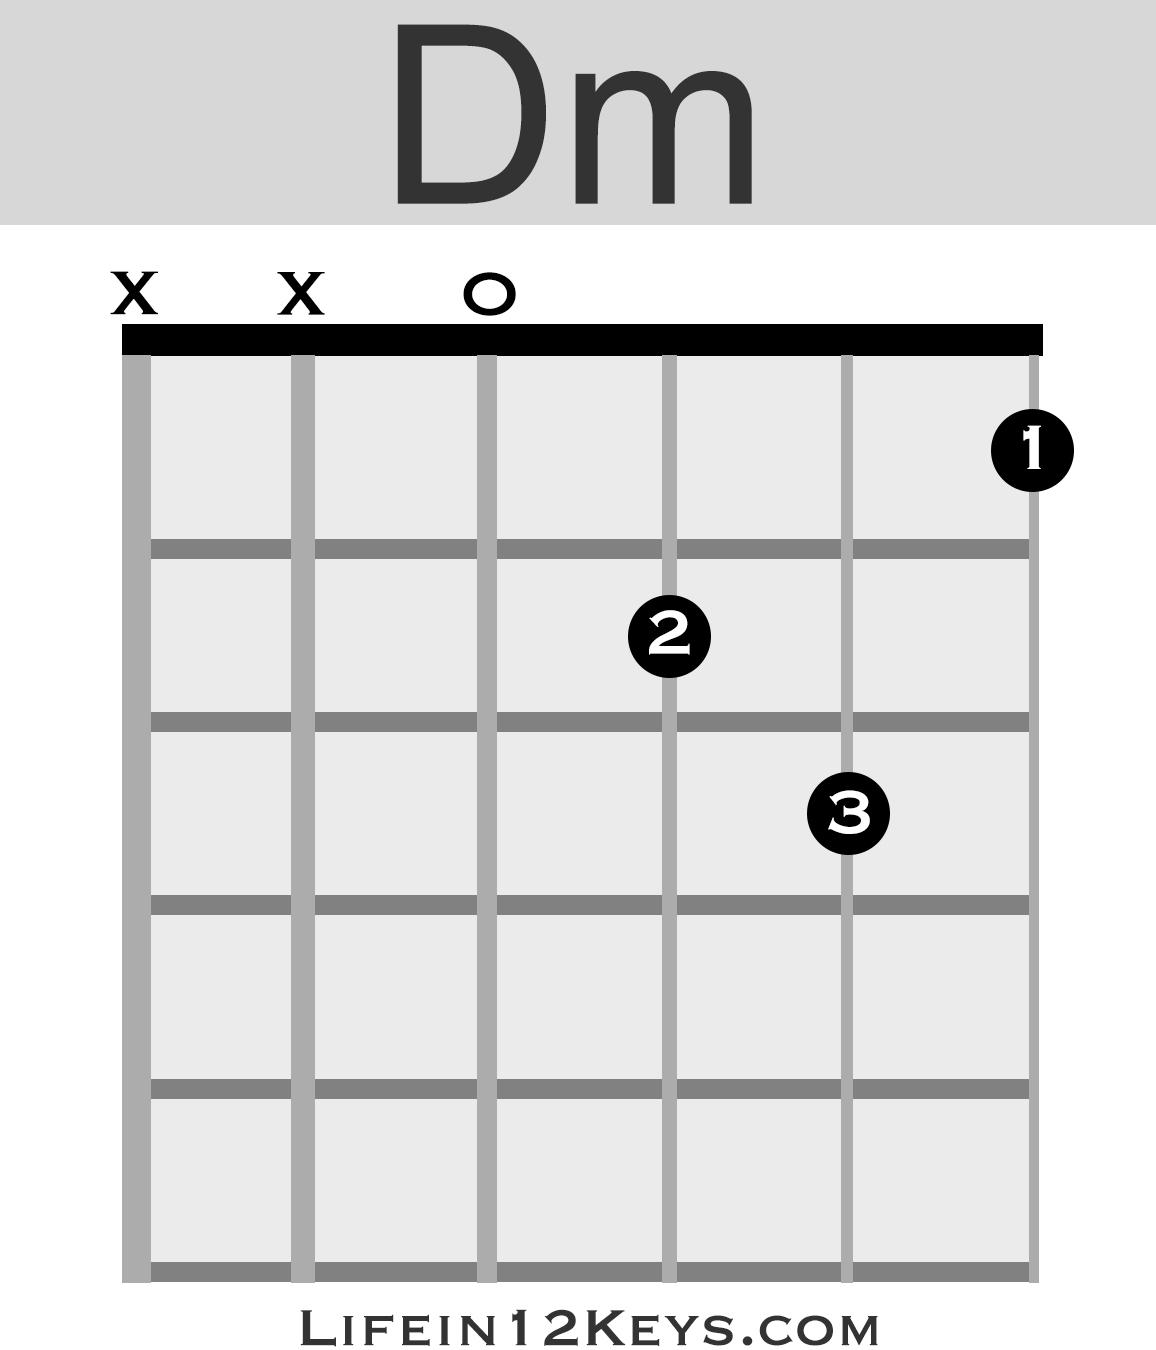 B Minor Guitar Chord 20 Essential Guitar Chords For Beginners Life In 12 Keys